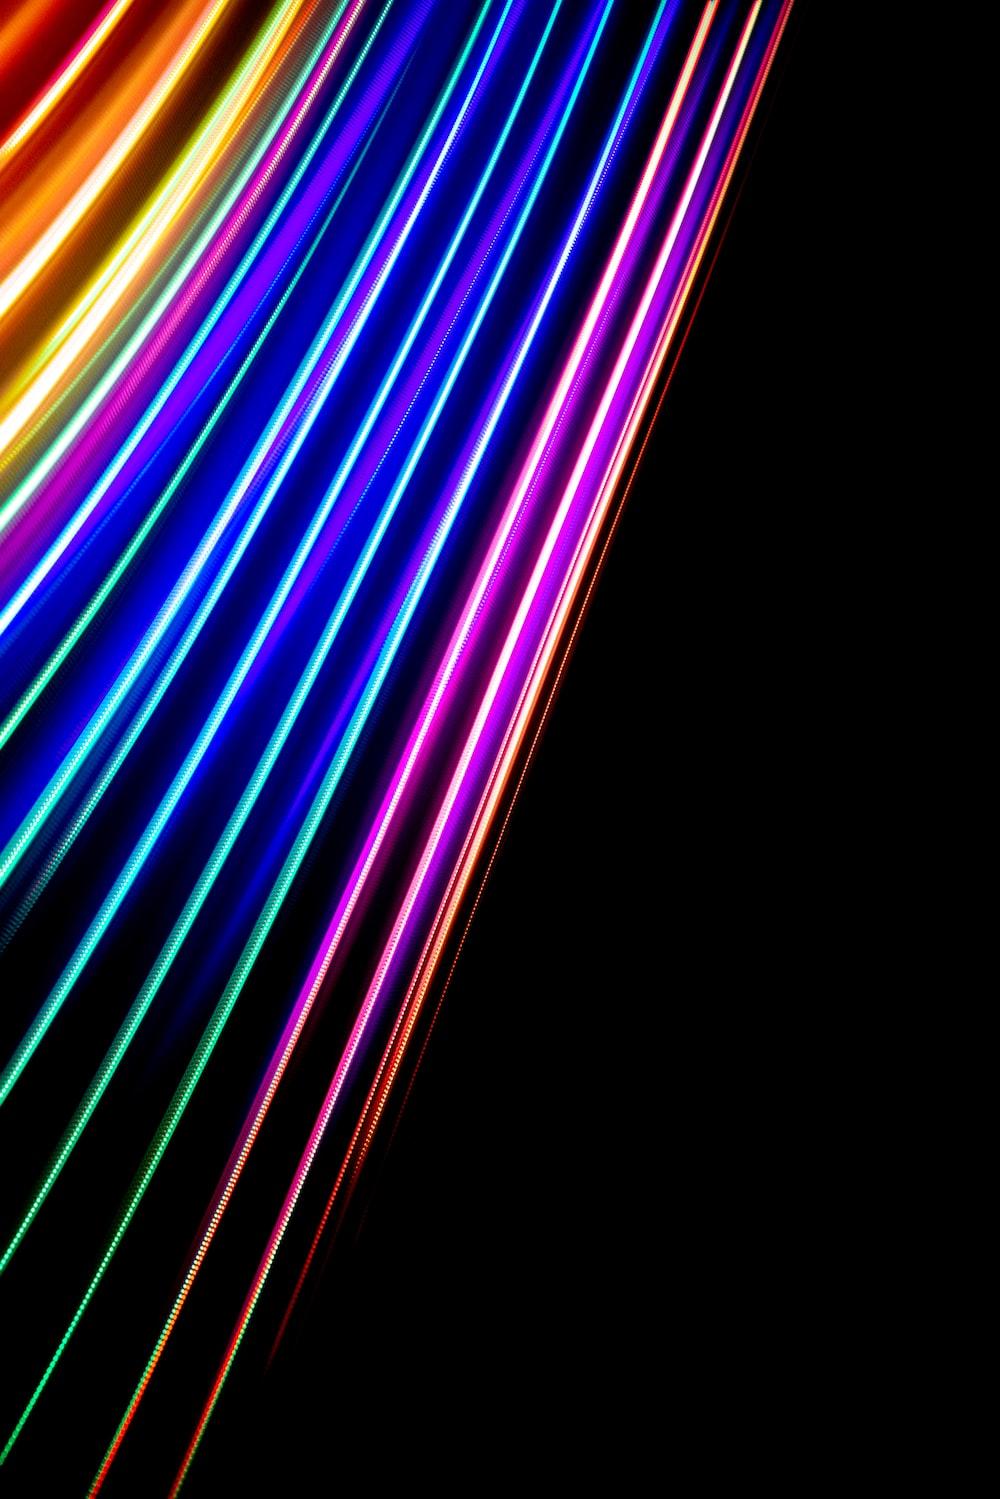 purple and yellow light streaks